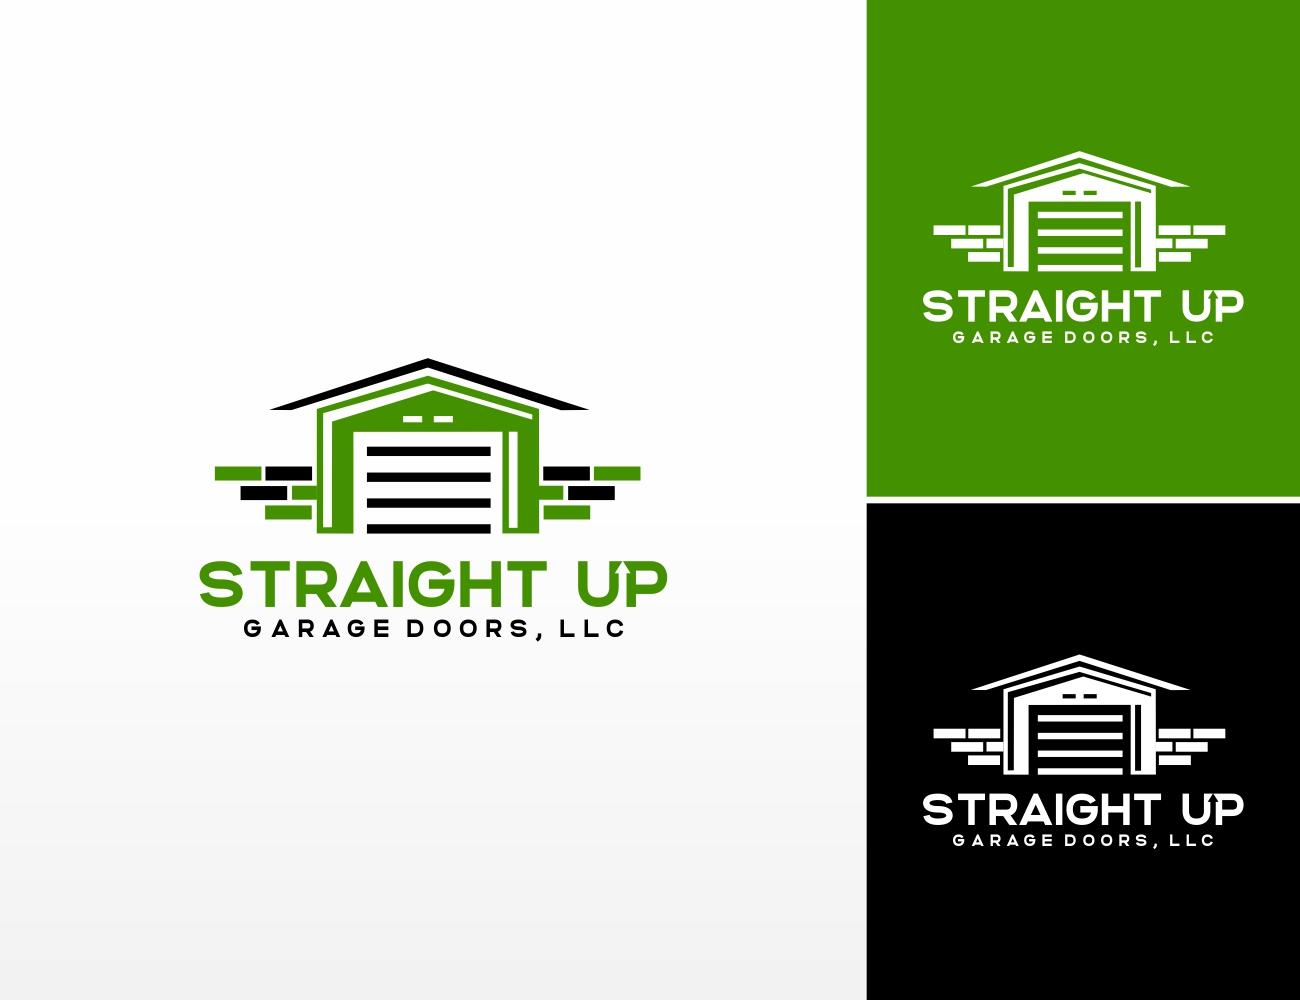 Logo Design Contest For Straight Up Garage Doors Llc Hatchwise